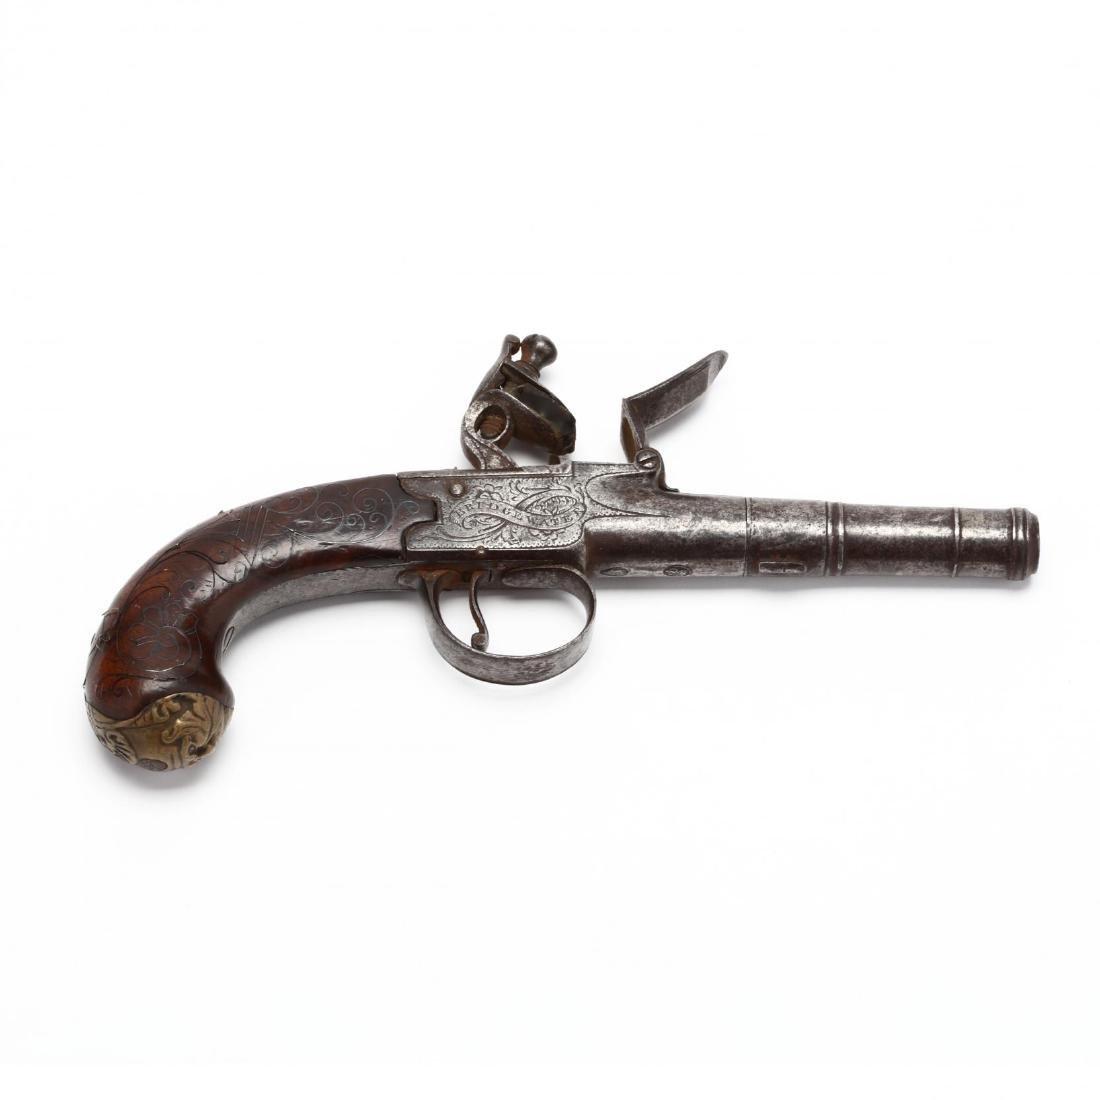 English Flintlock Pocket Pistol With Screw-On Barrel